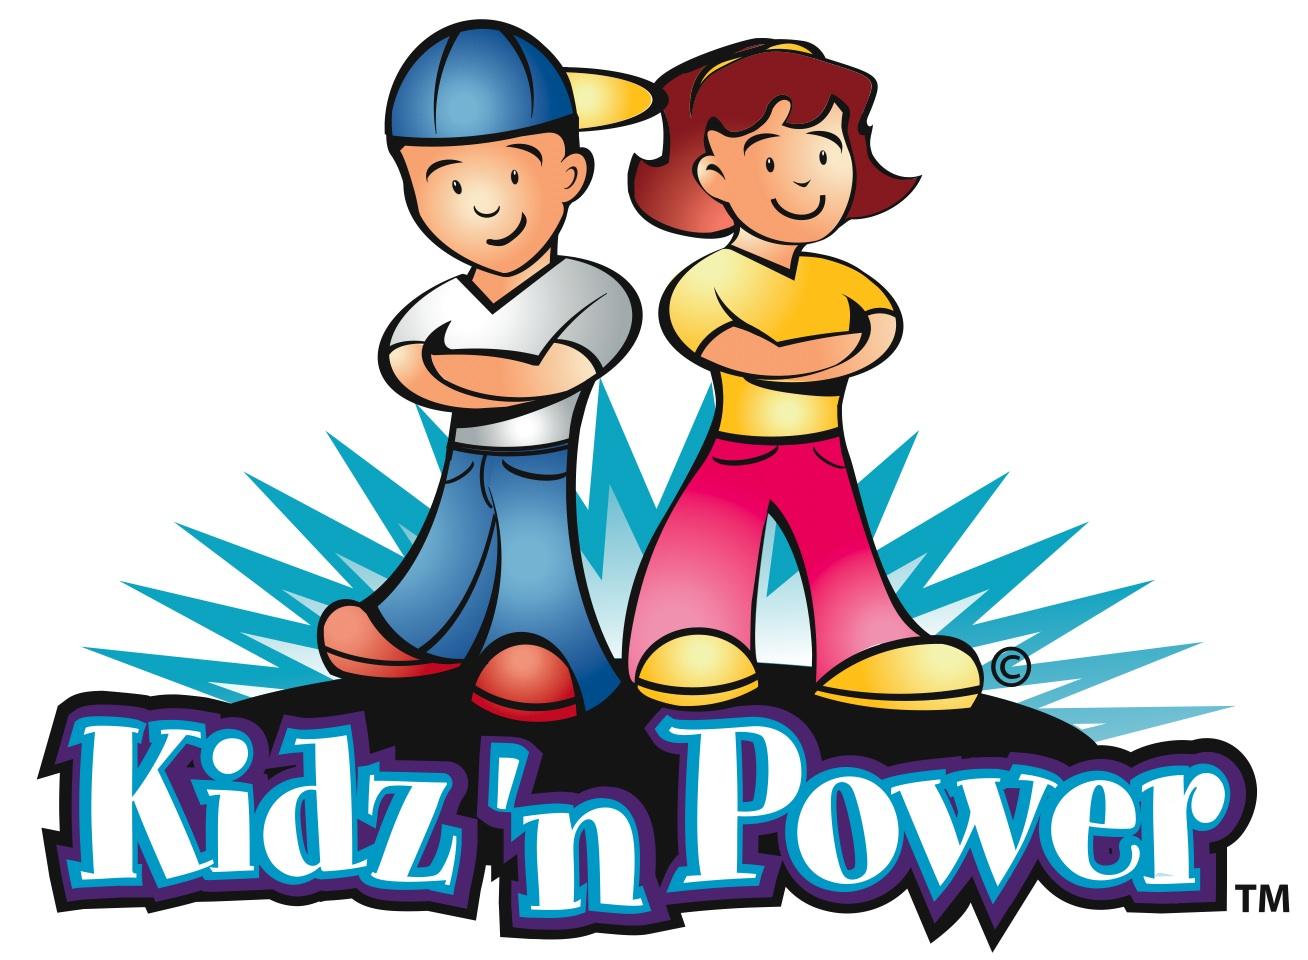 Kidz 'N Power